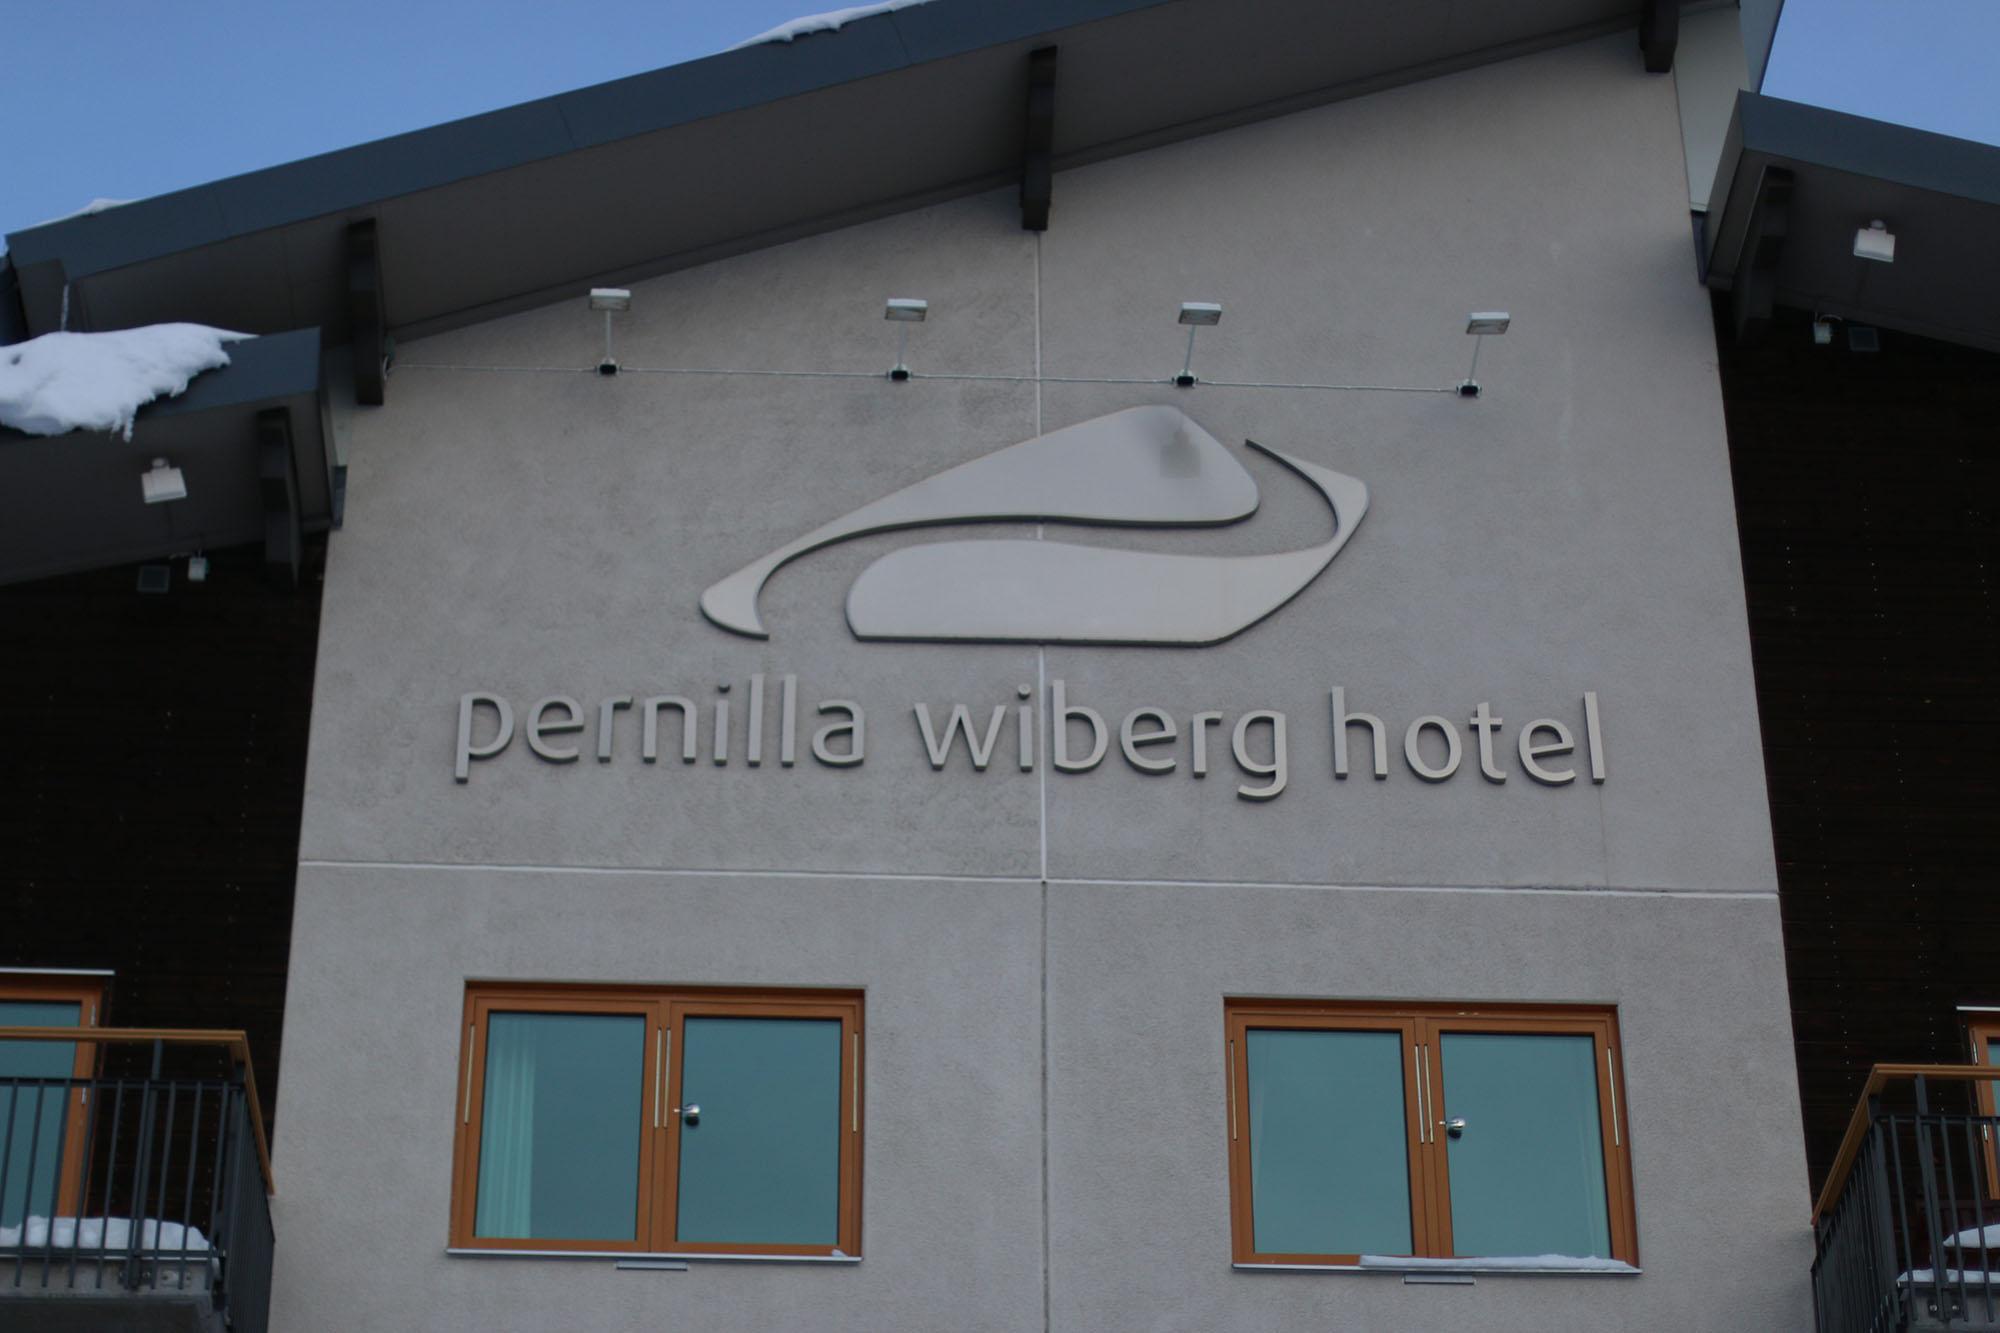 IMG_0379idre pernilla wiberg hotell x